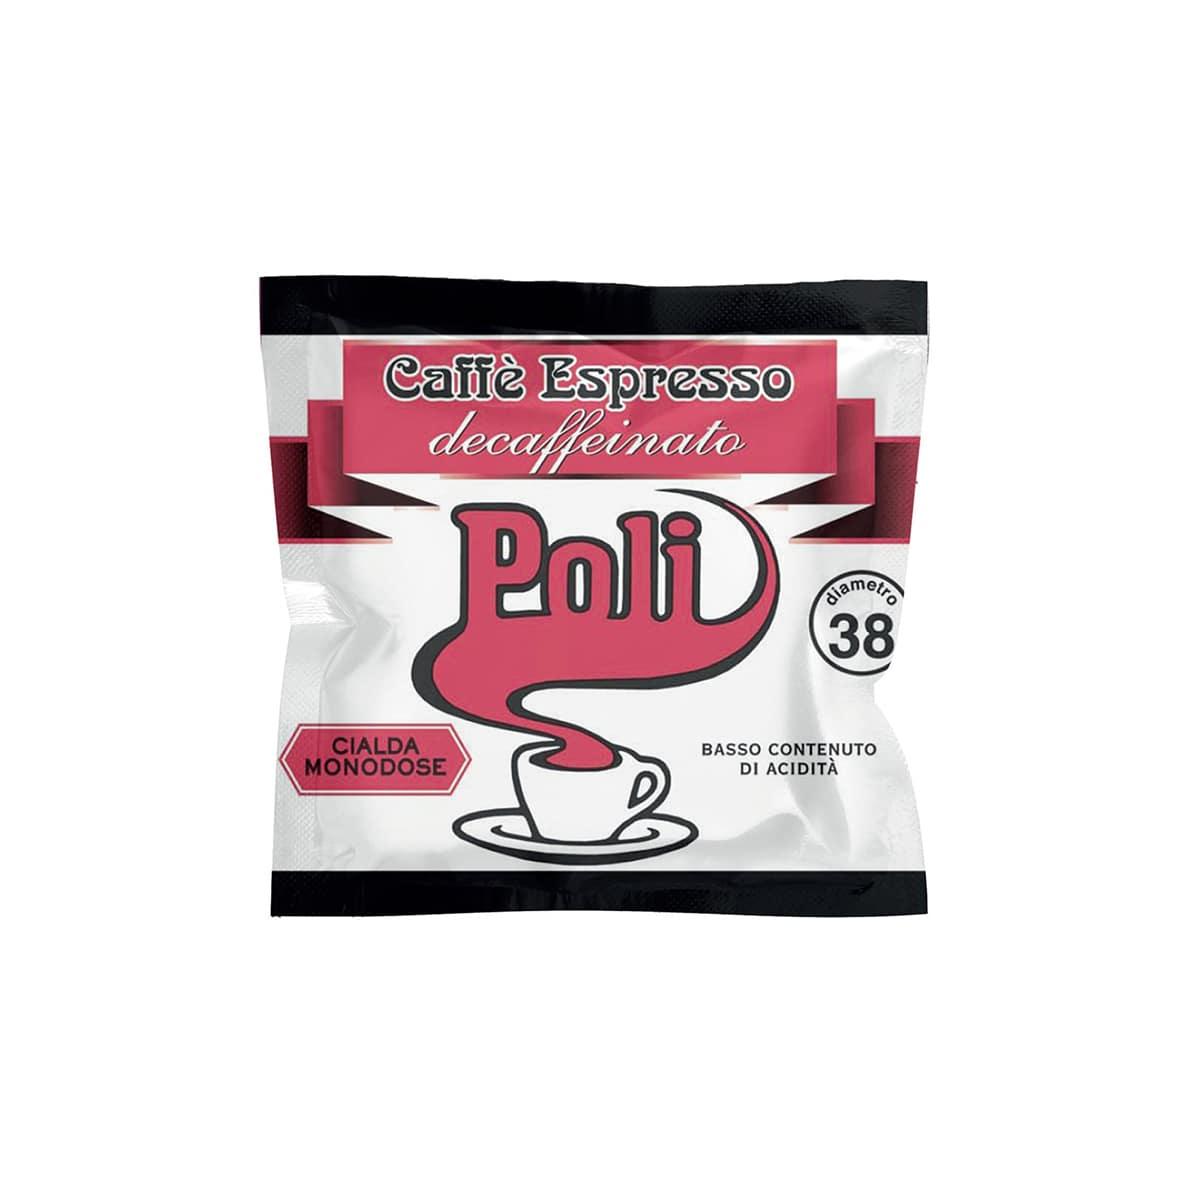 Decaf Espresso 38mm Diameter Pods In Pods Ese & 38 Format